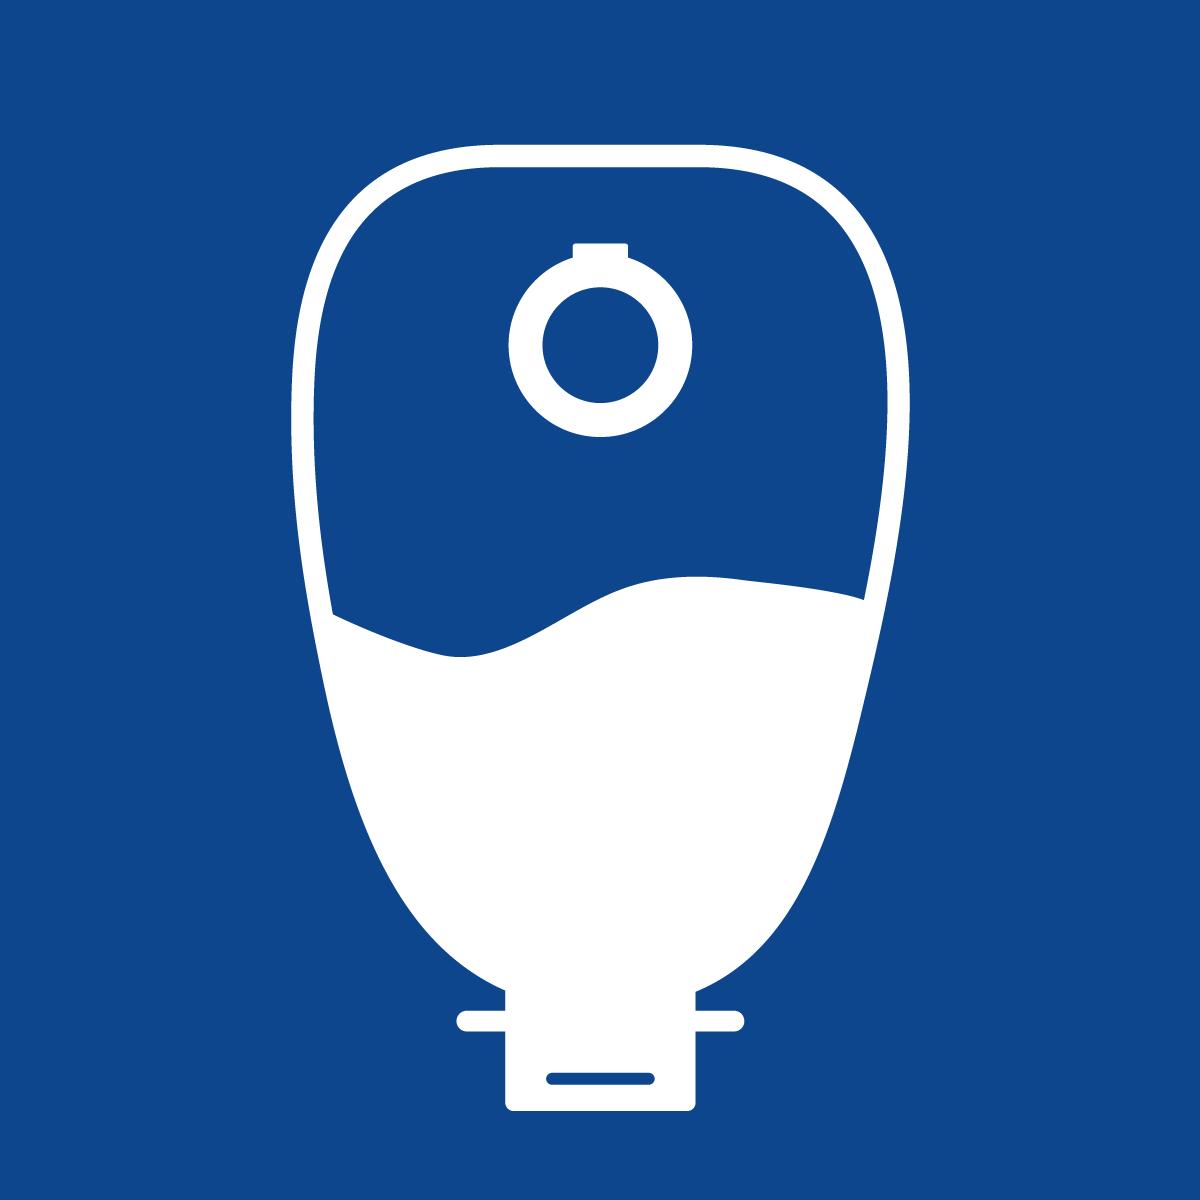 Ostomates Icon / Symbol